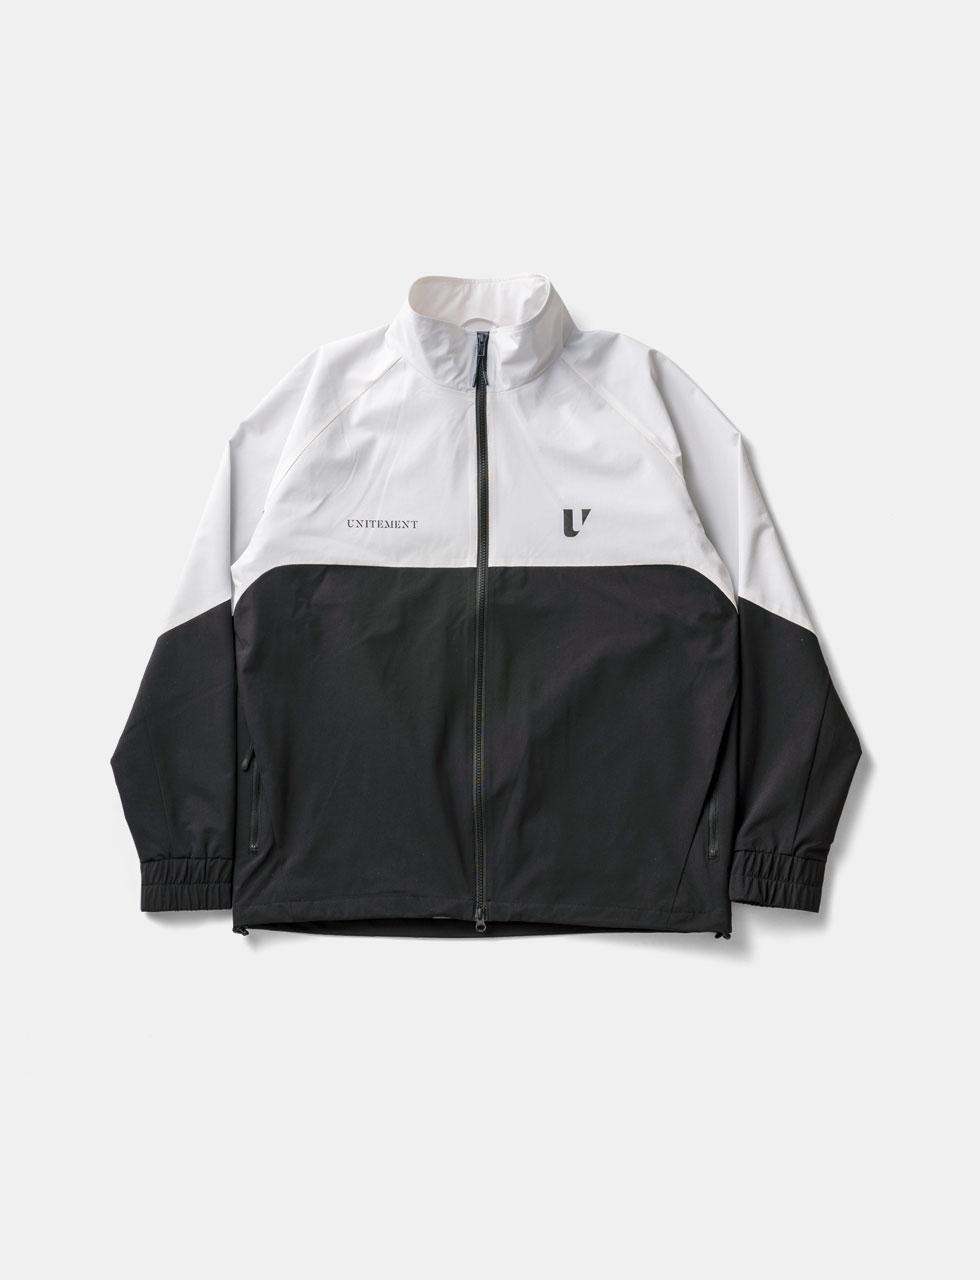 Warm Up Wind Block Jacket